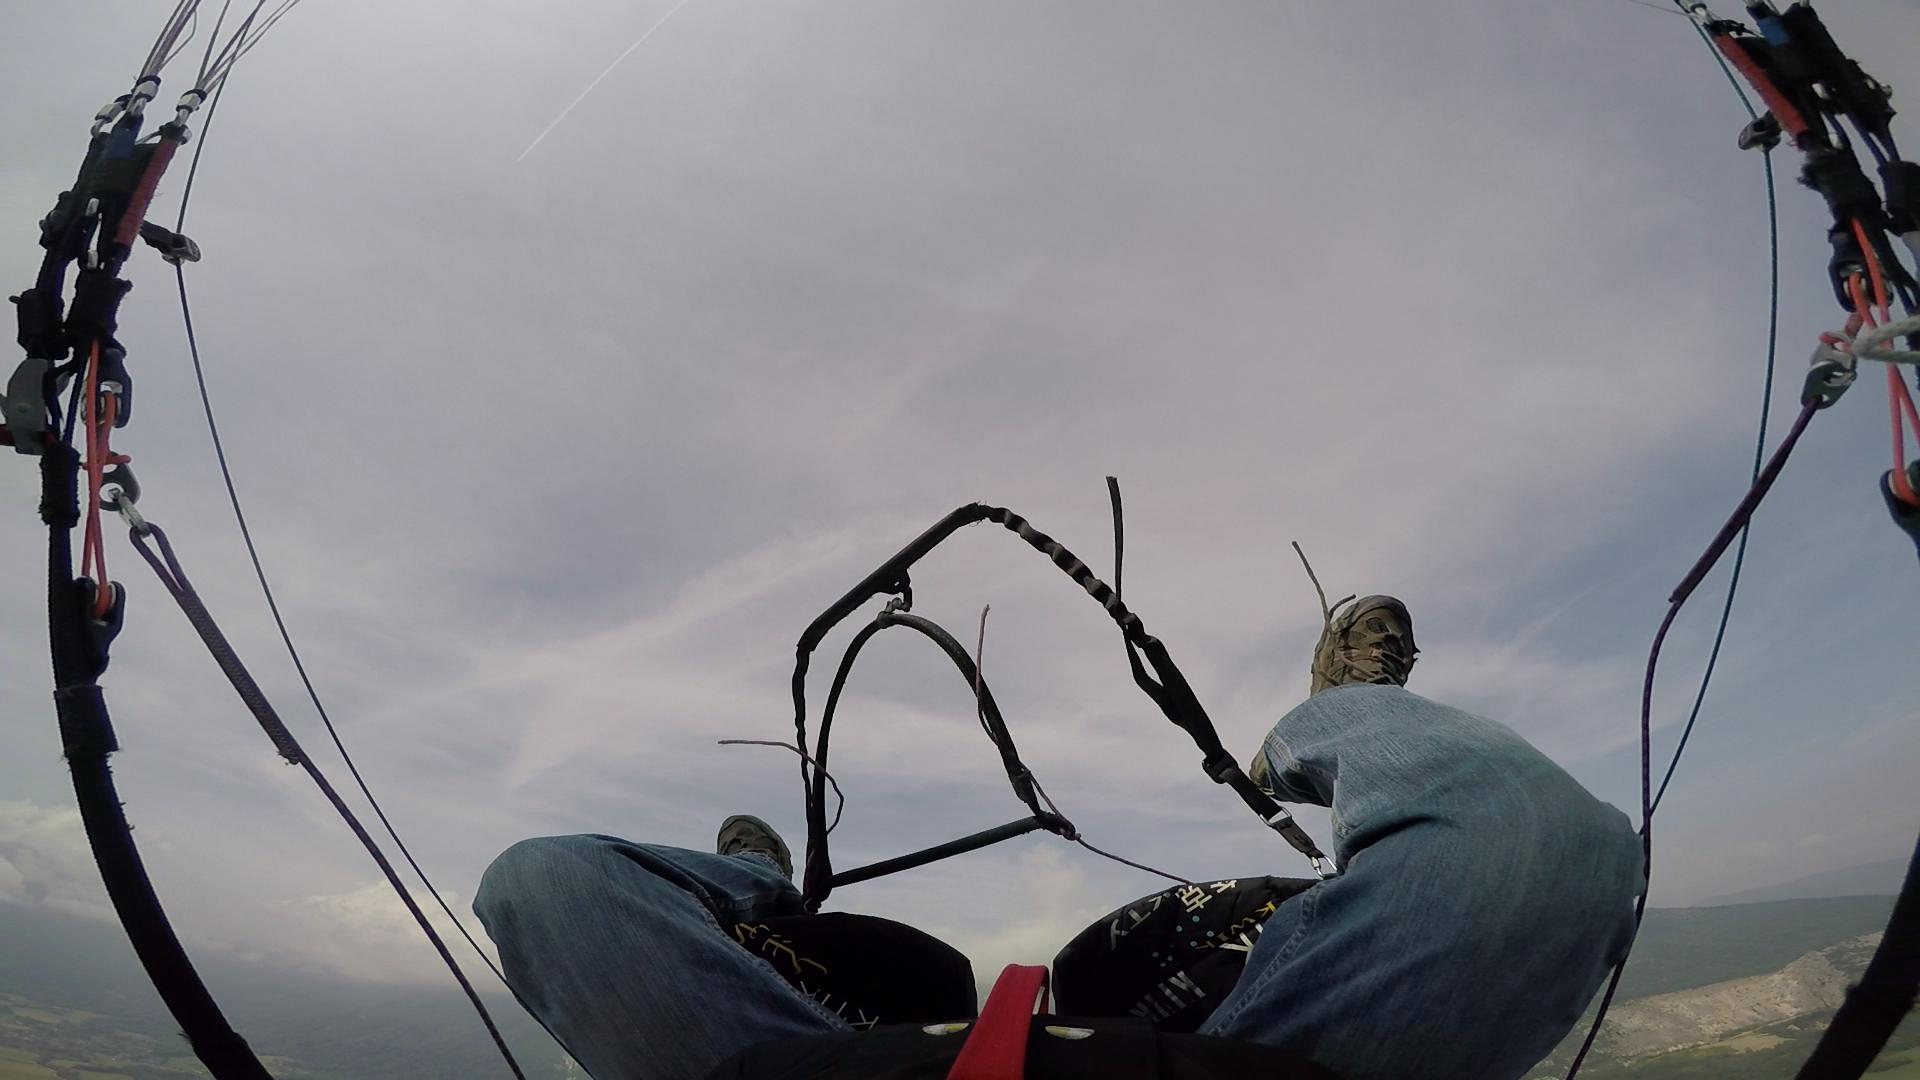 paragliding full stall